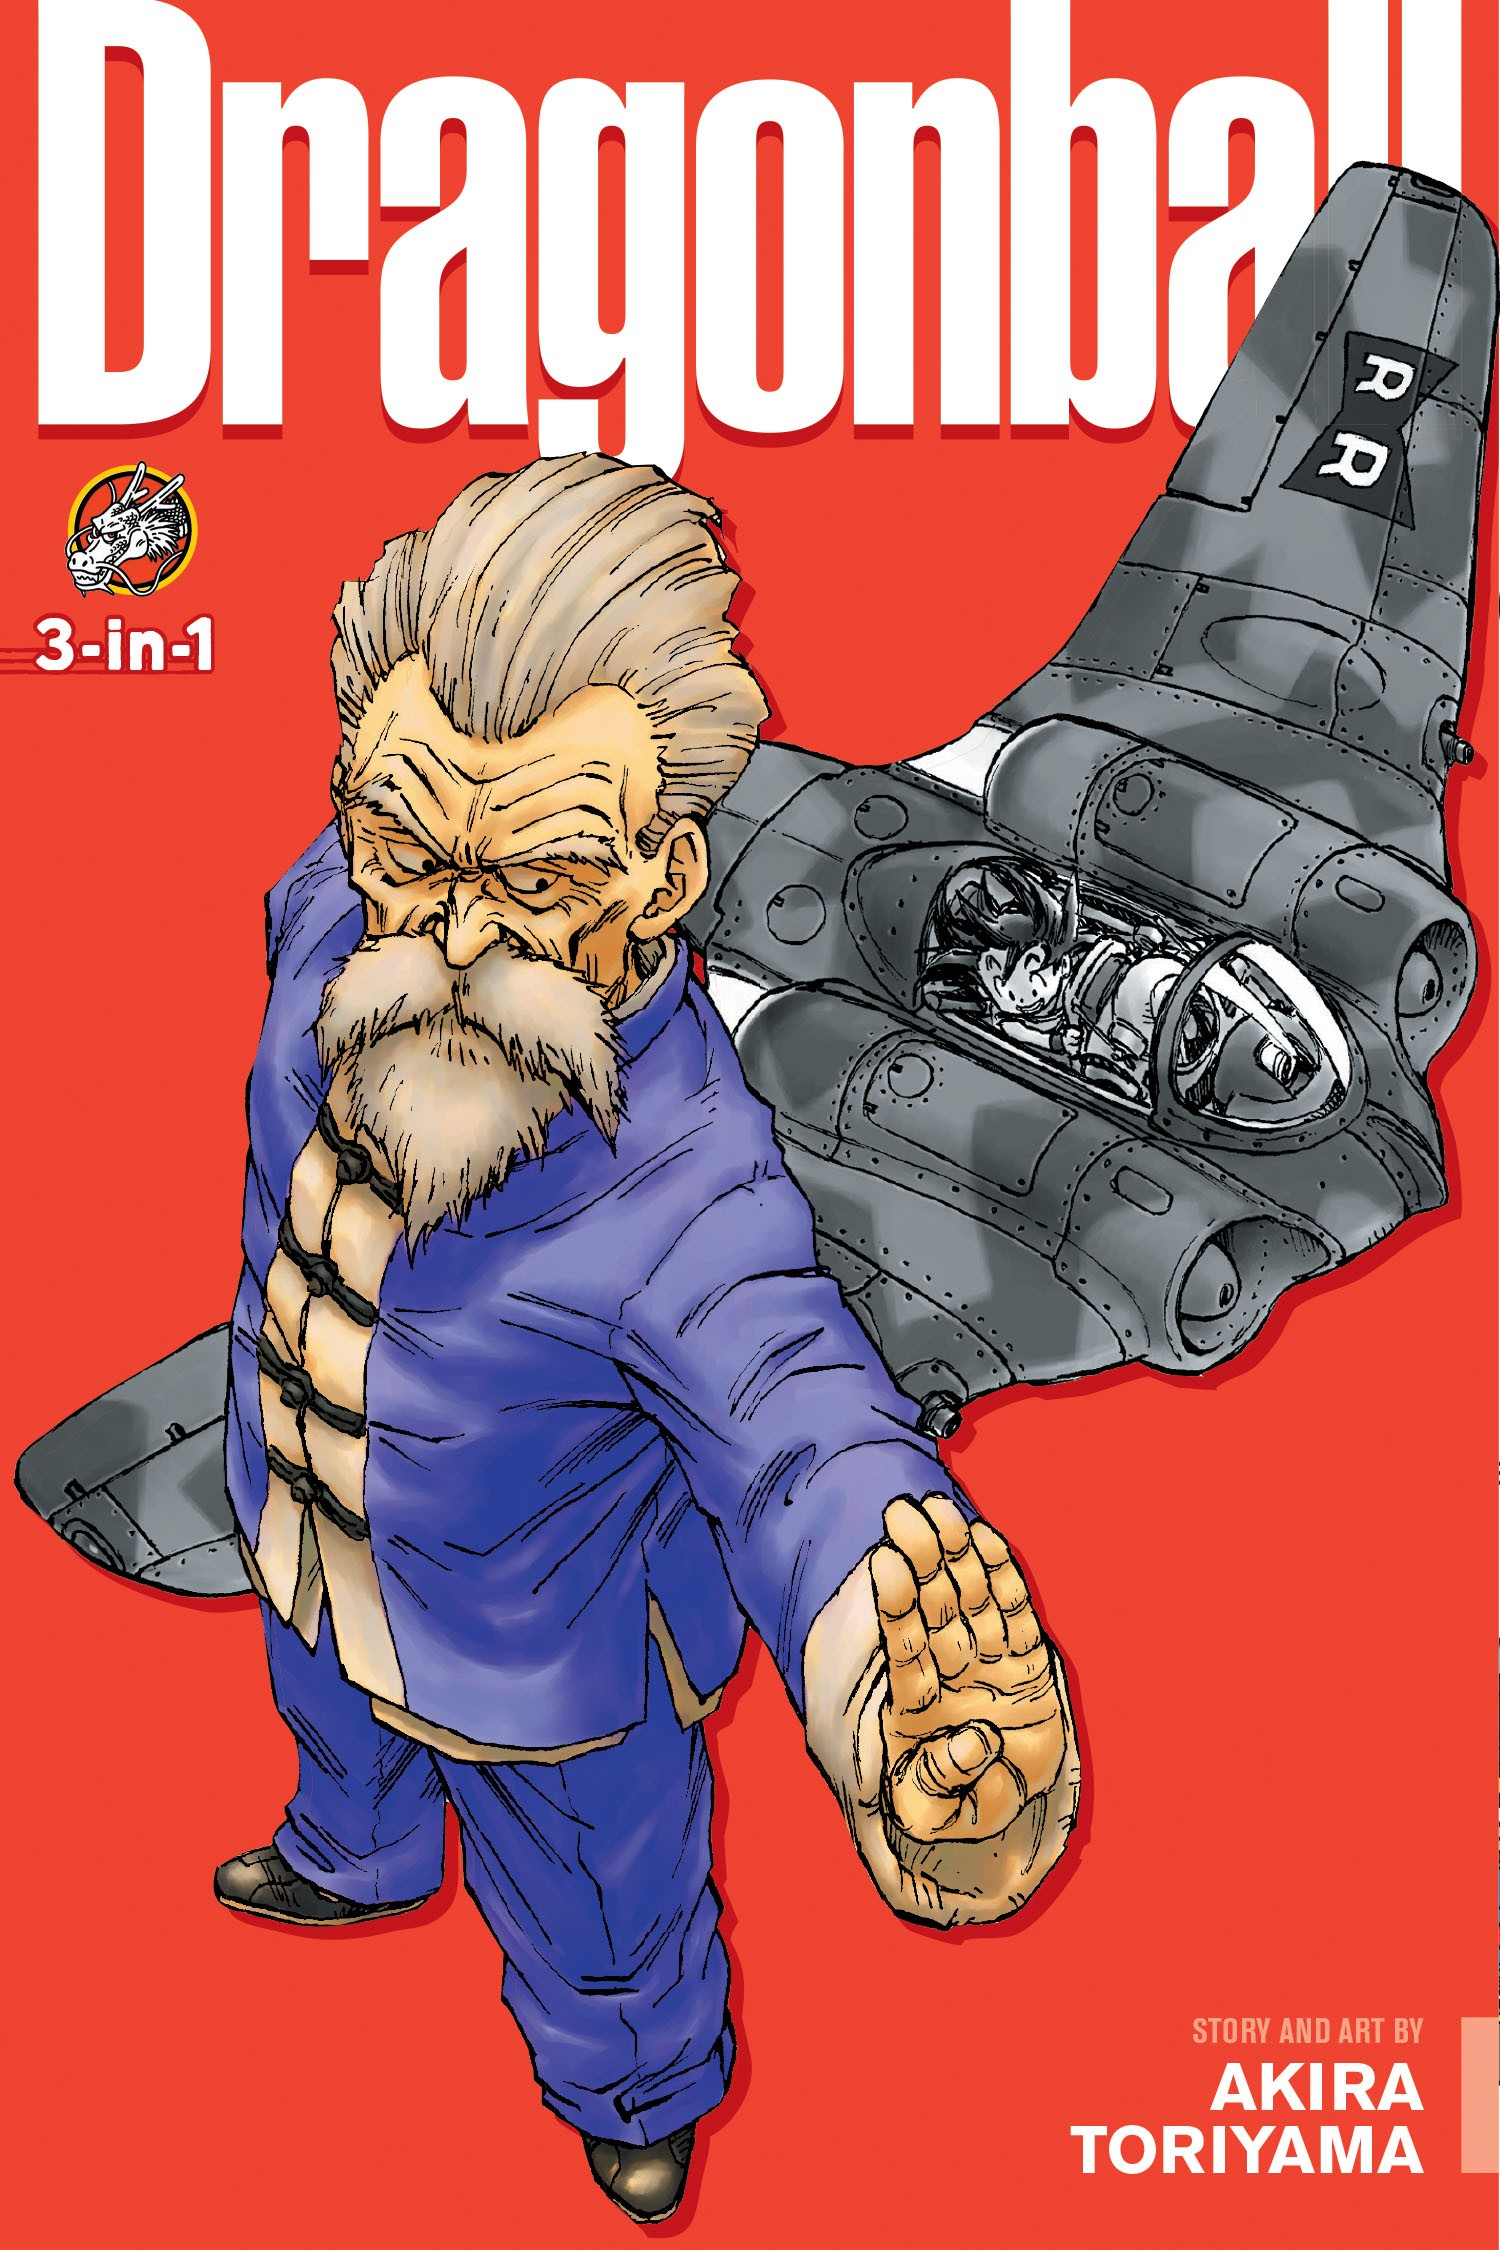 Dragon Ball (3-in-1 Edition), Vol. 02 by Akira Toriyama